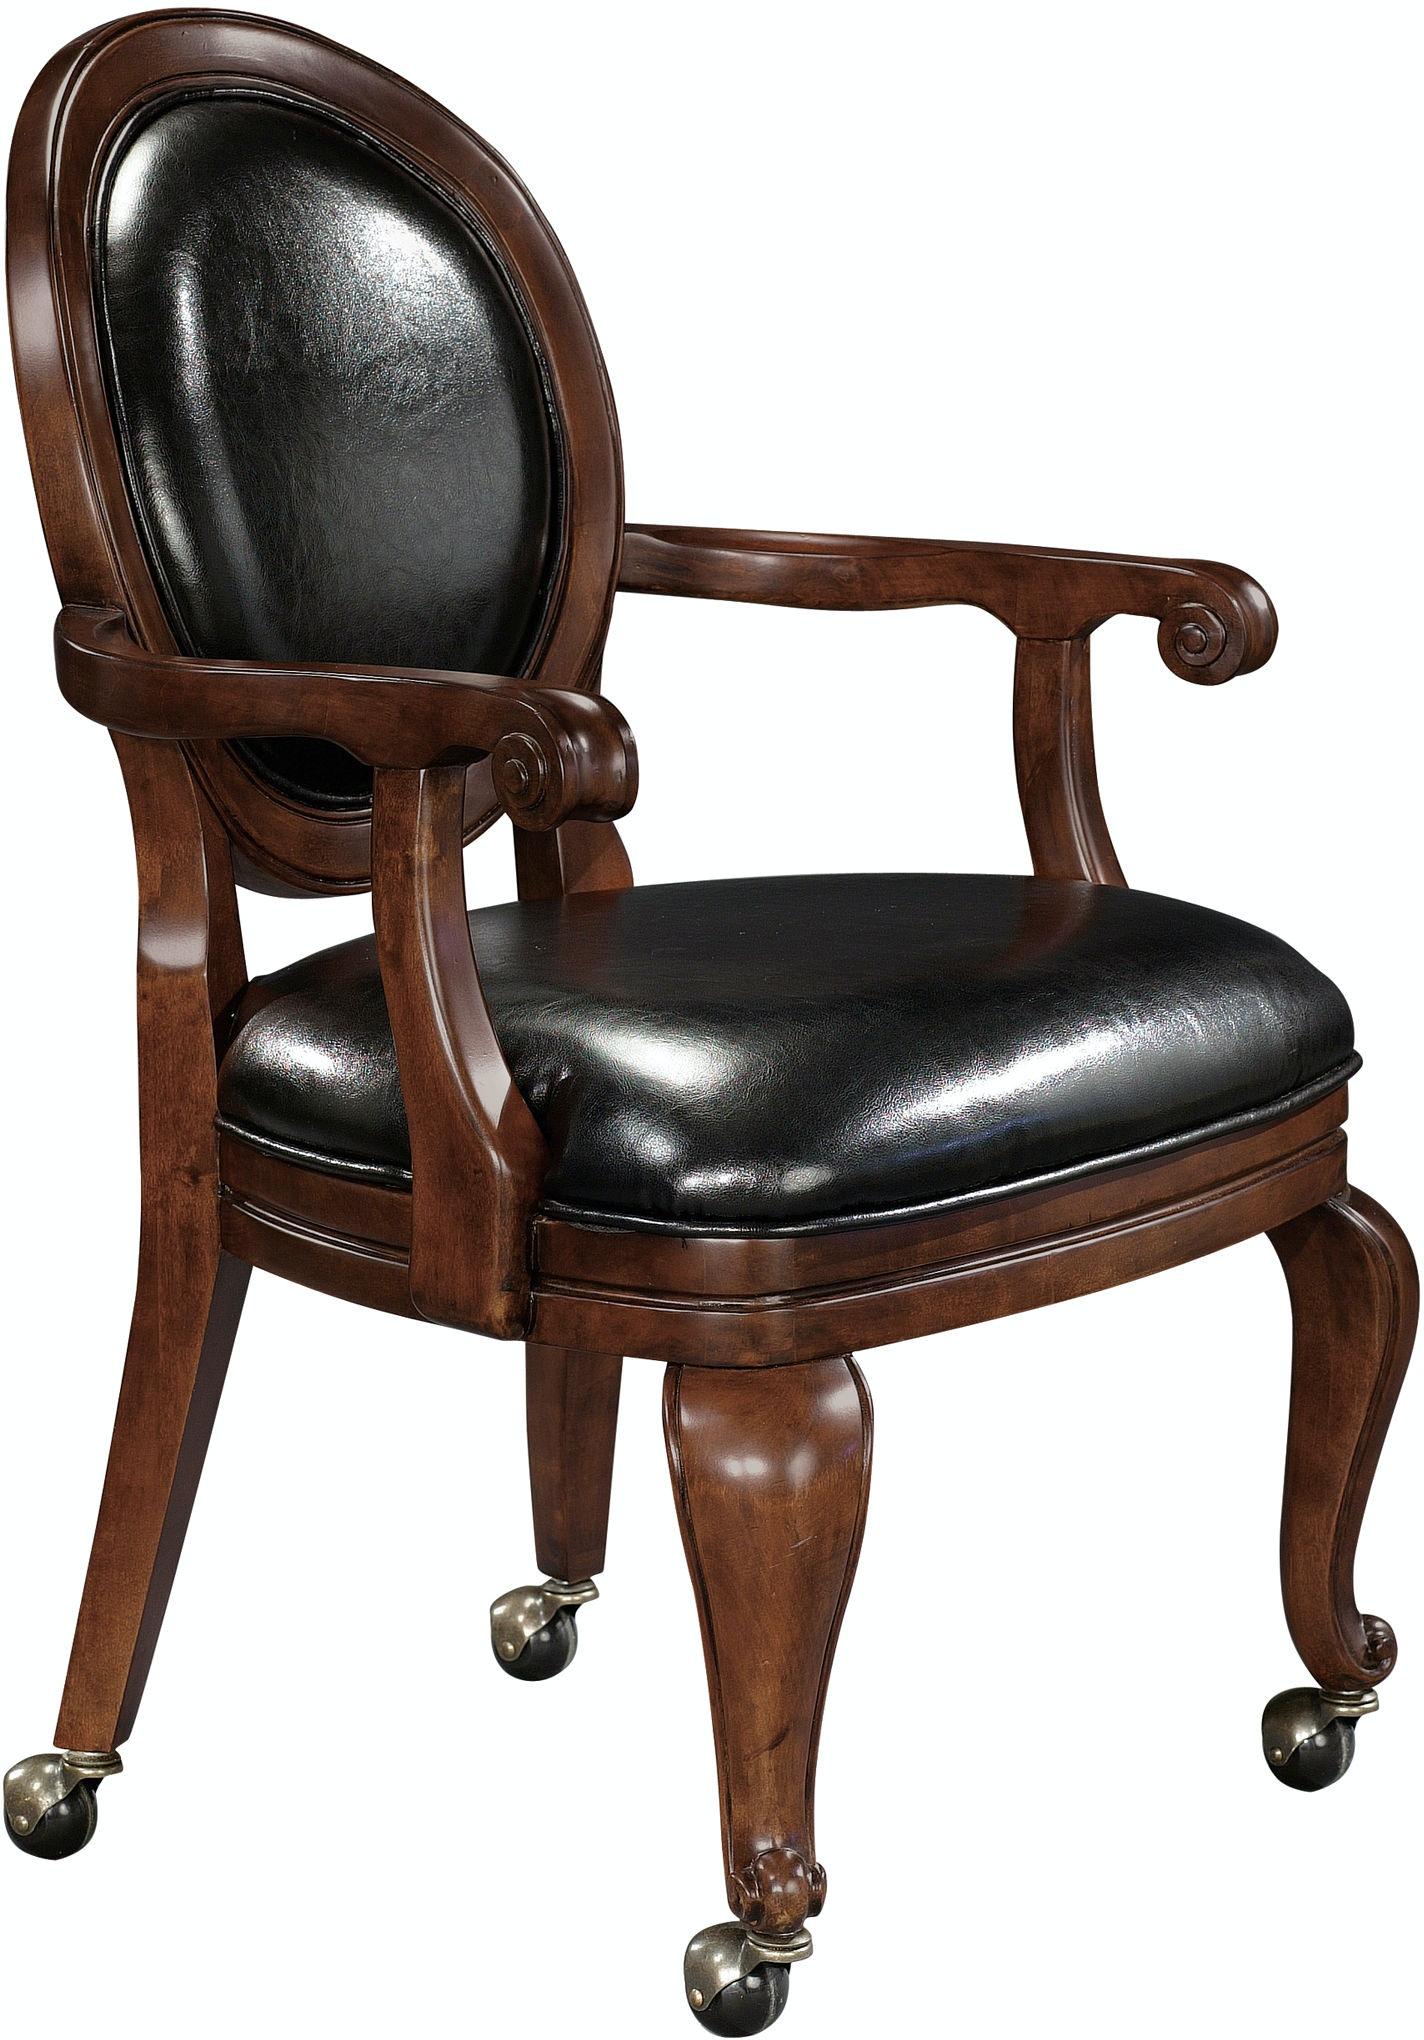 Howard Miller Bar and Game Room Niagara Club Chair 697013  : 697013 from www.woodbridgeinteriors.com size 1024 x 768 jpeg 39kB